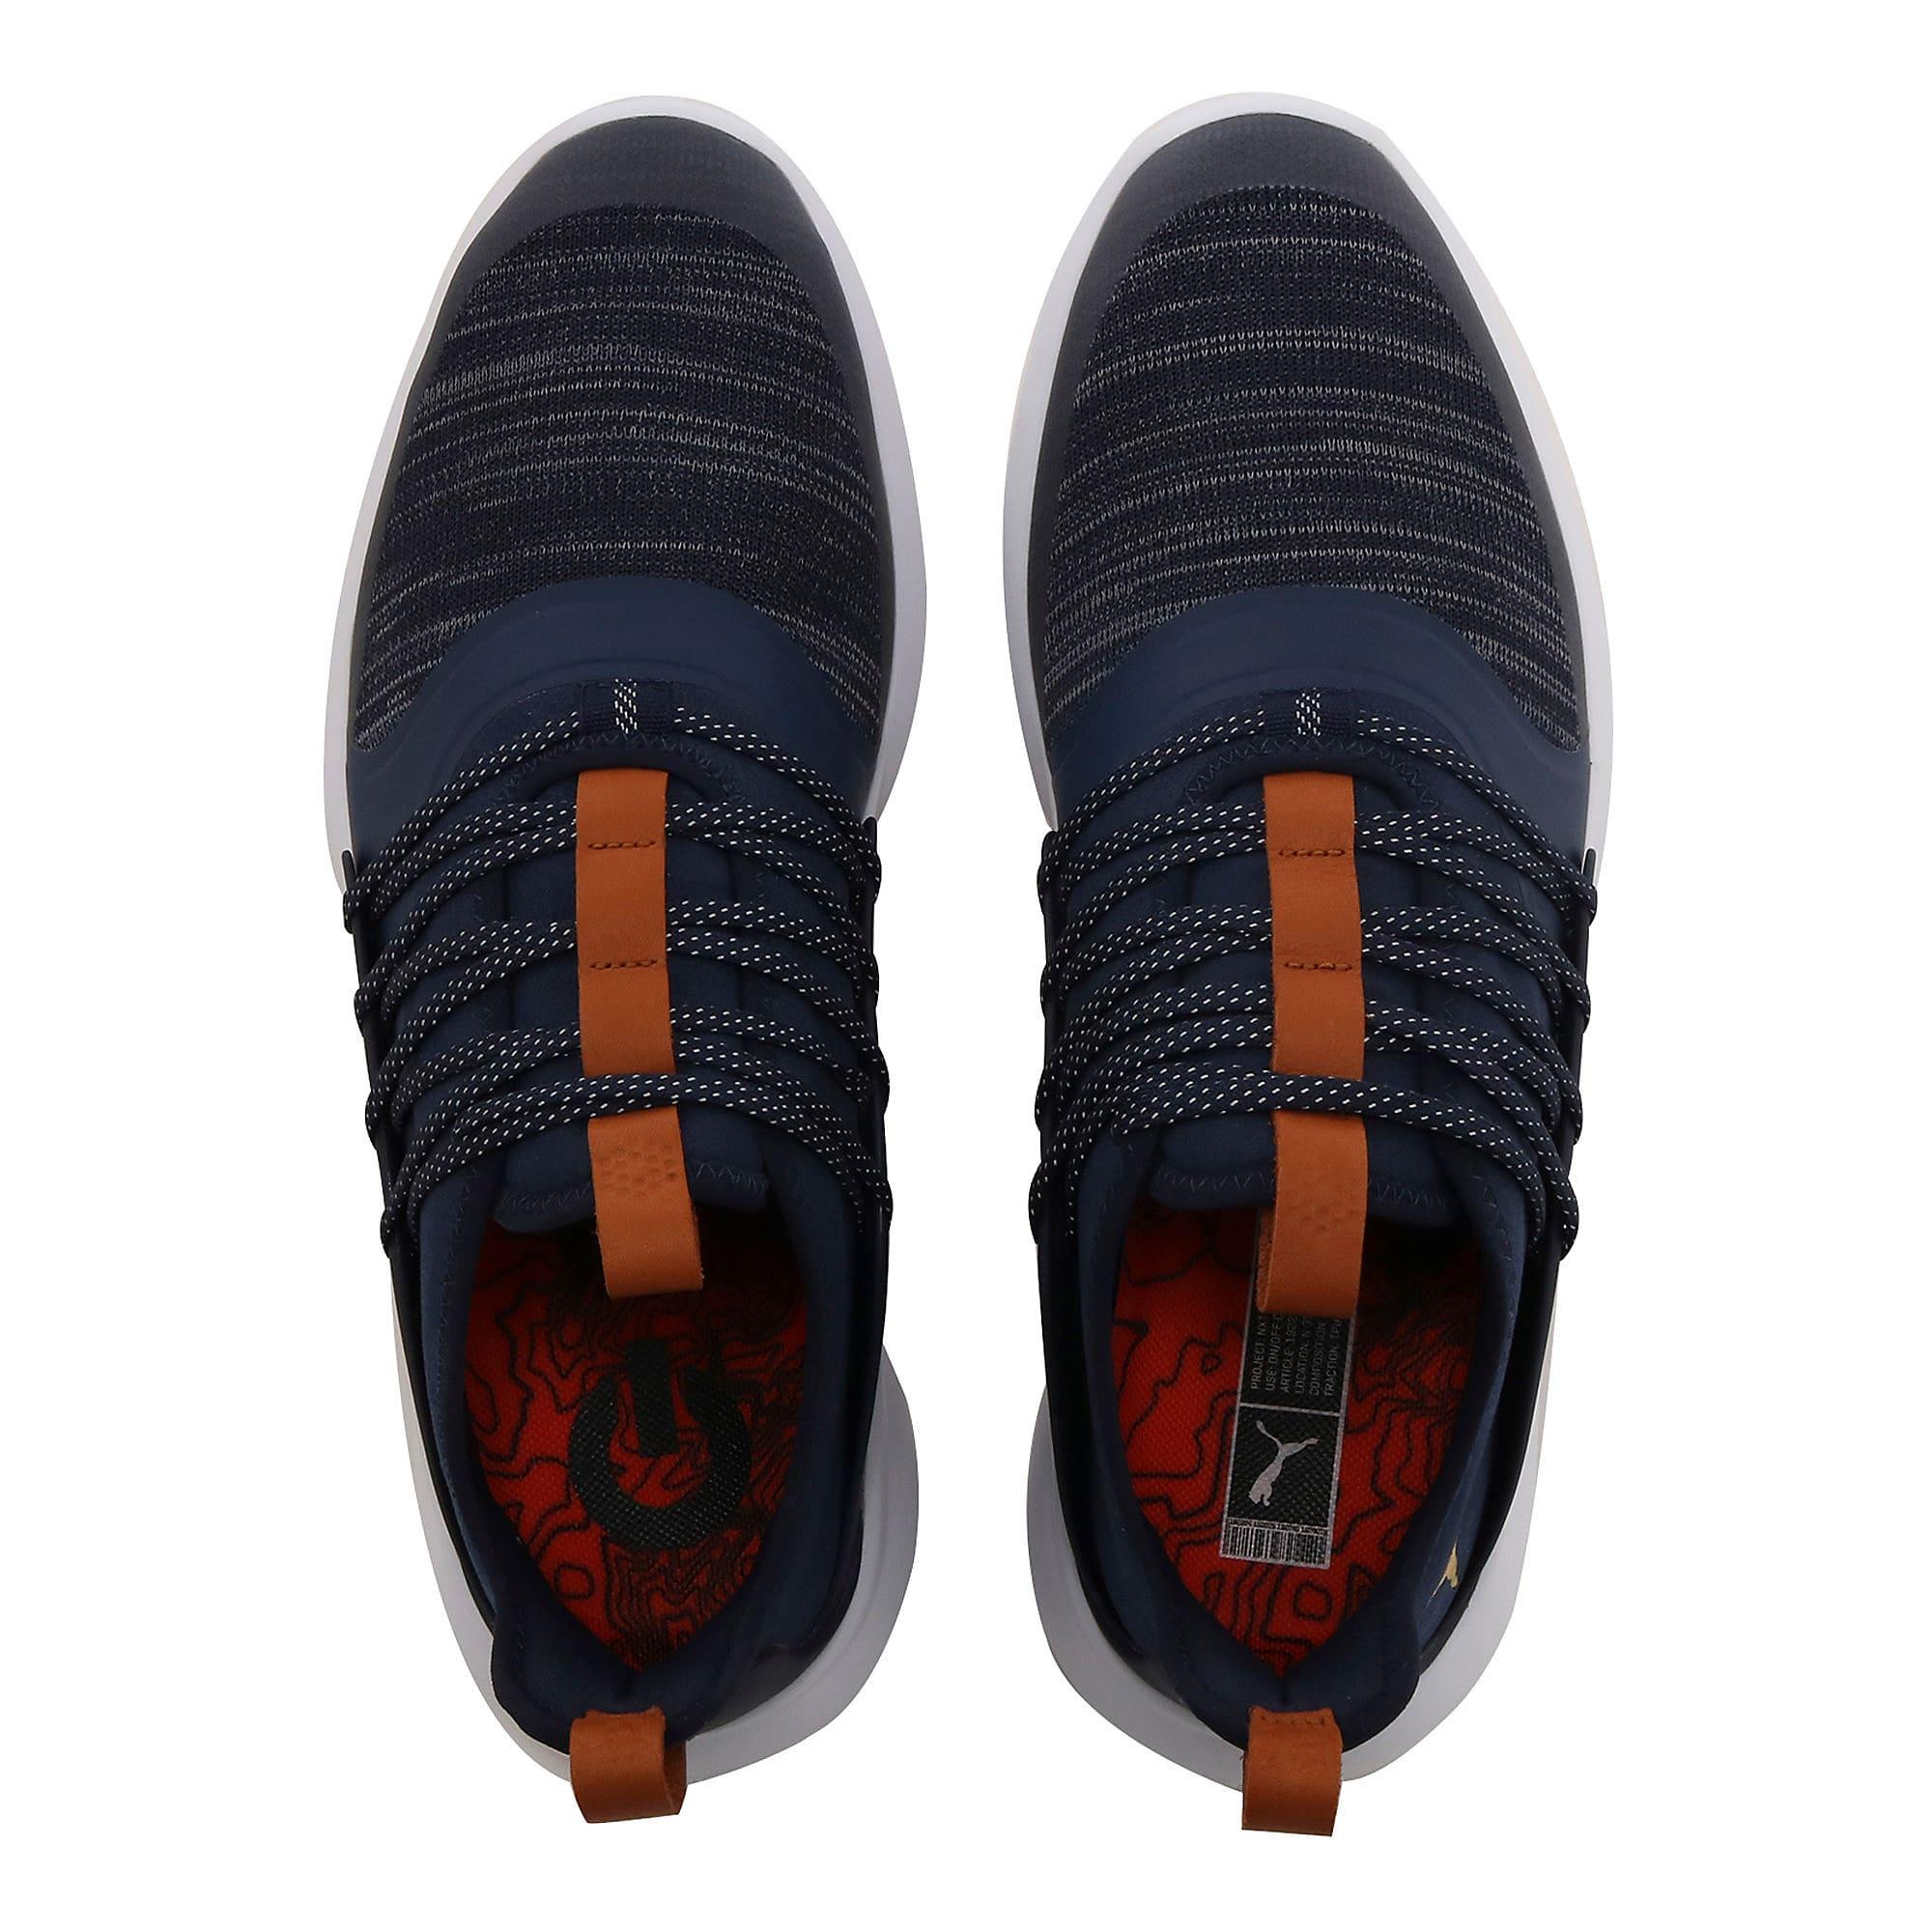 Thumbnail 6 of IGNITE NXT SOLELACE Men's Golf Shoes, Peacoat-Gold, medium